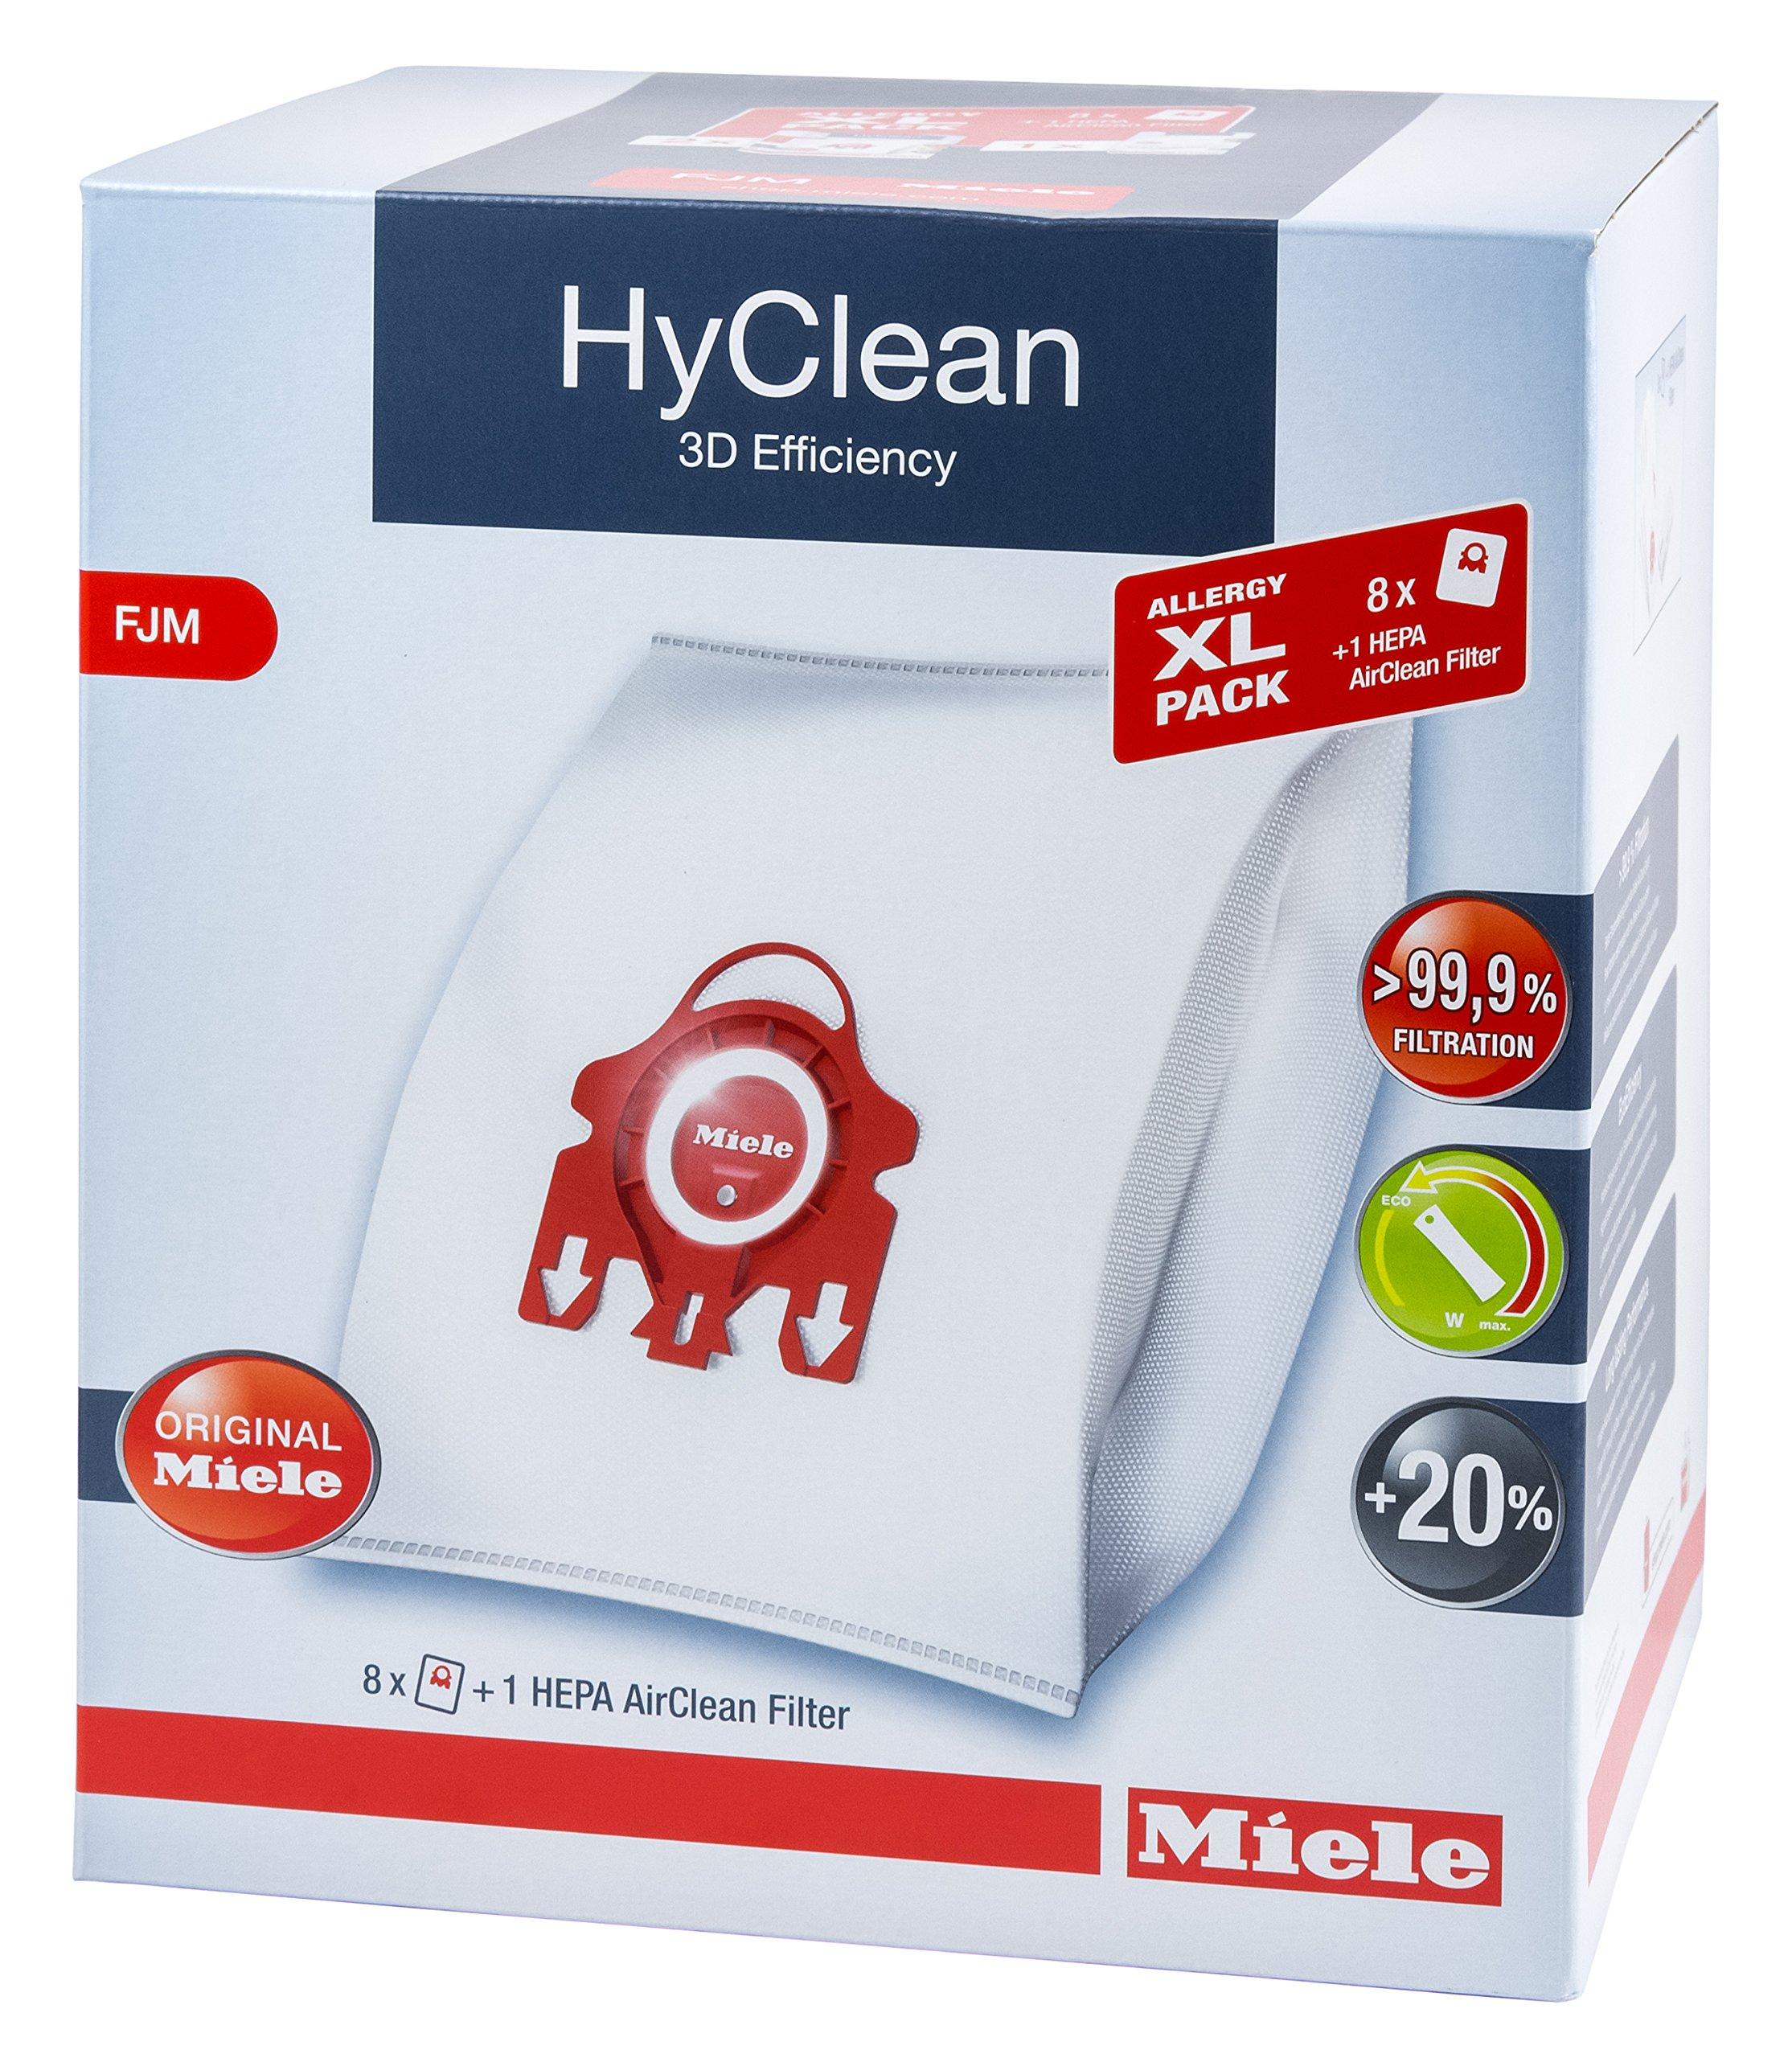 Miele XL Pack - 8X Hyclean 3D FJM Vacuum Bags +1 Hepa Filter SF-HA 50 by Miele